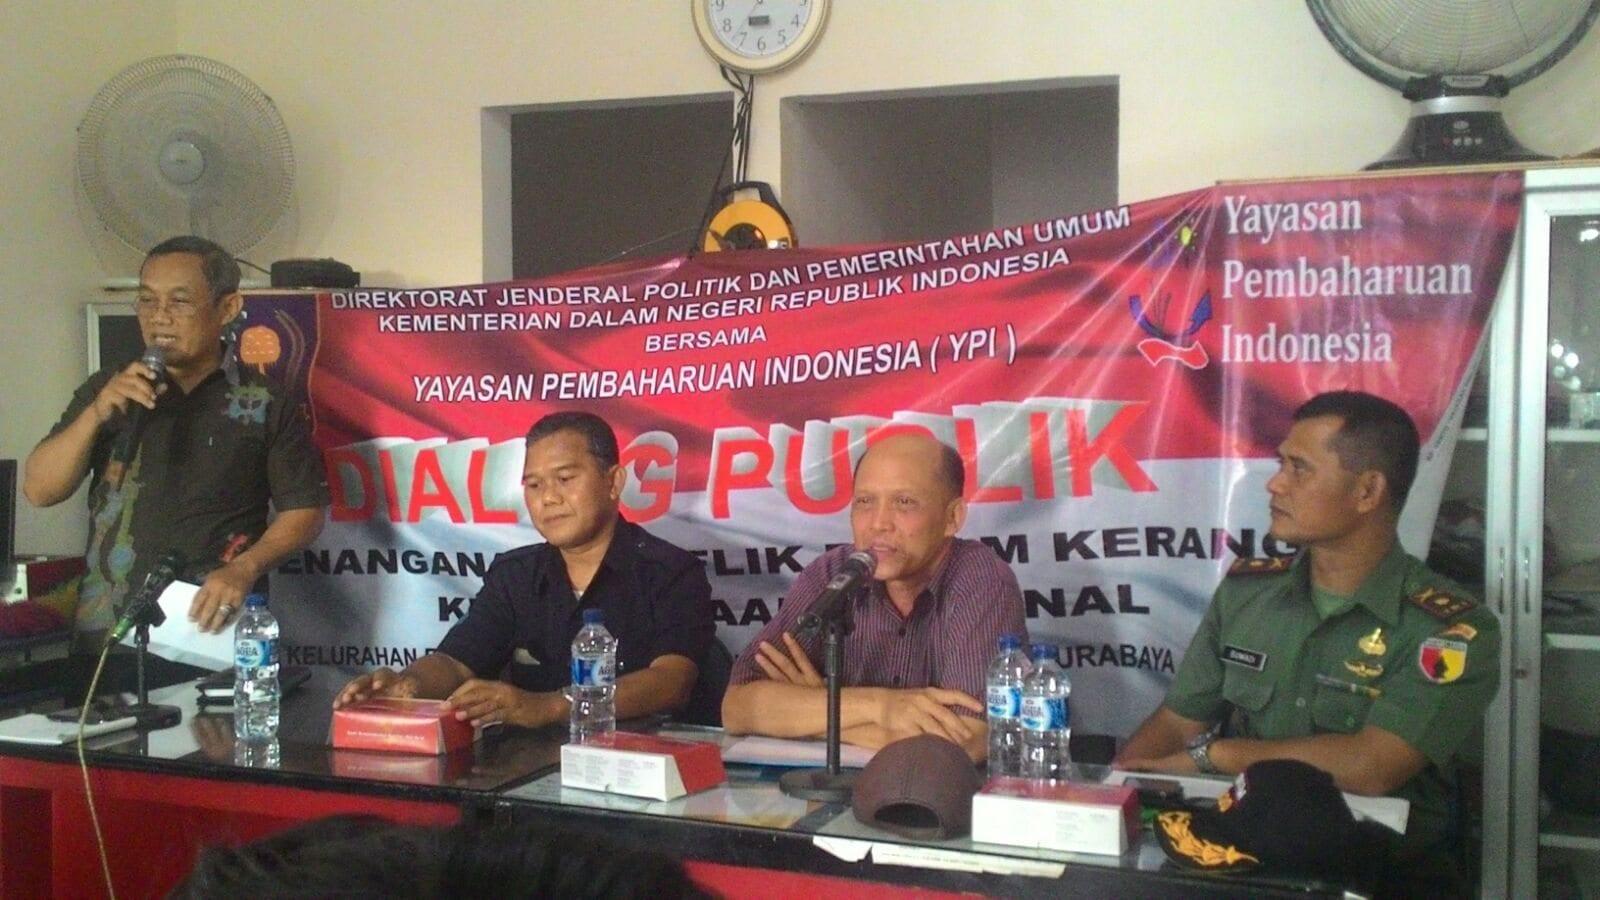 Koramil dan Muspika Pabean Cantain, Buka Dialog Publik Untuk Warga